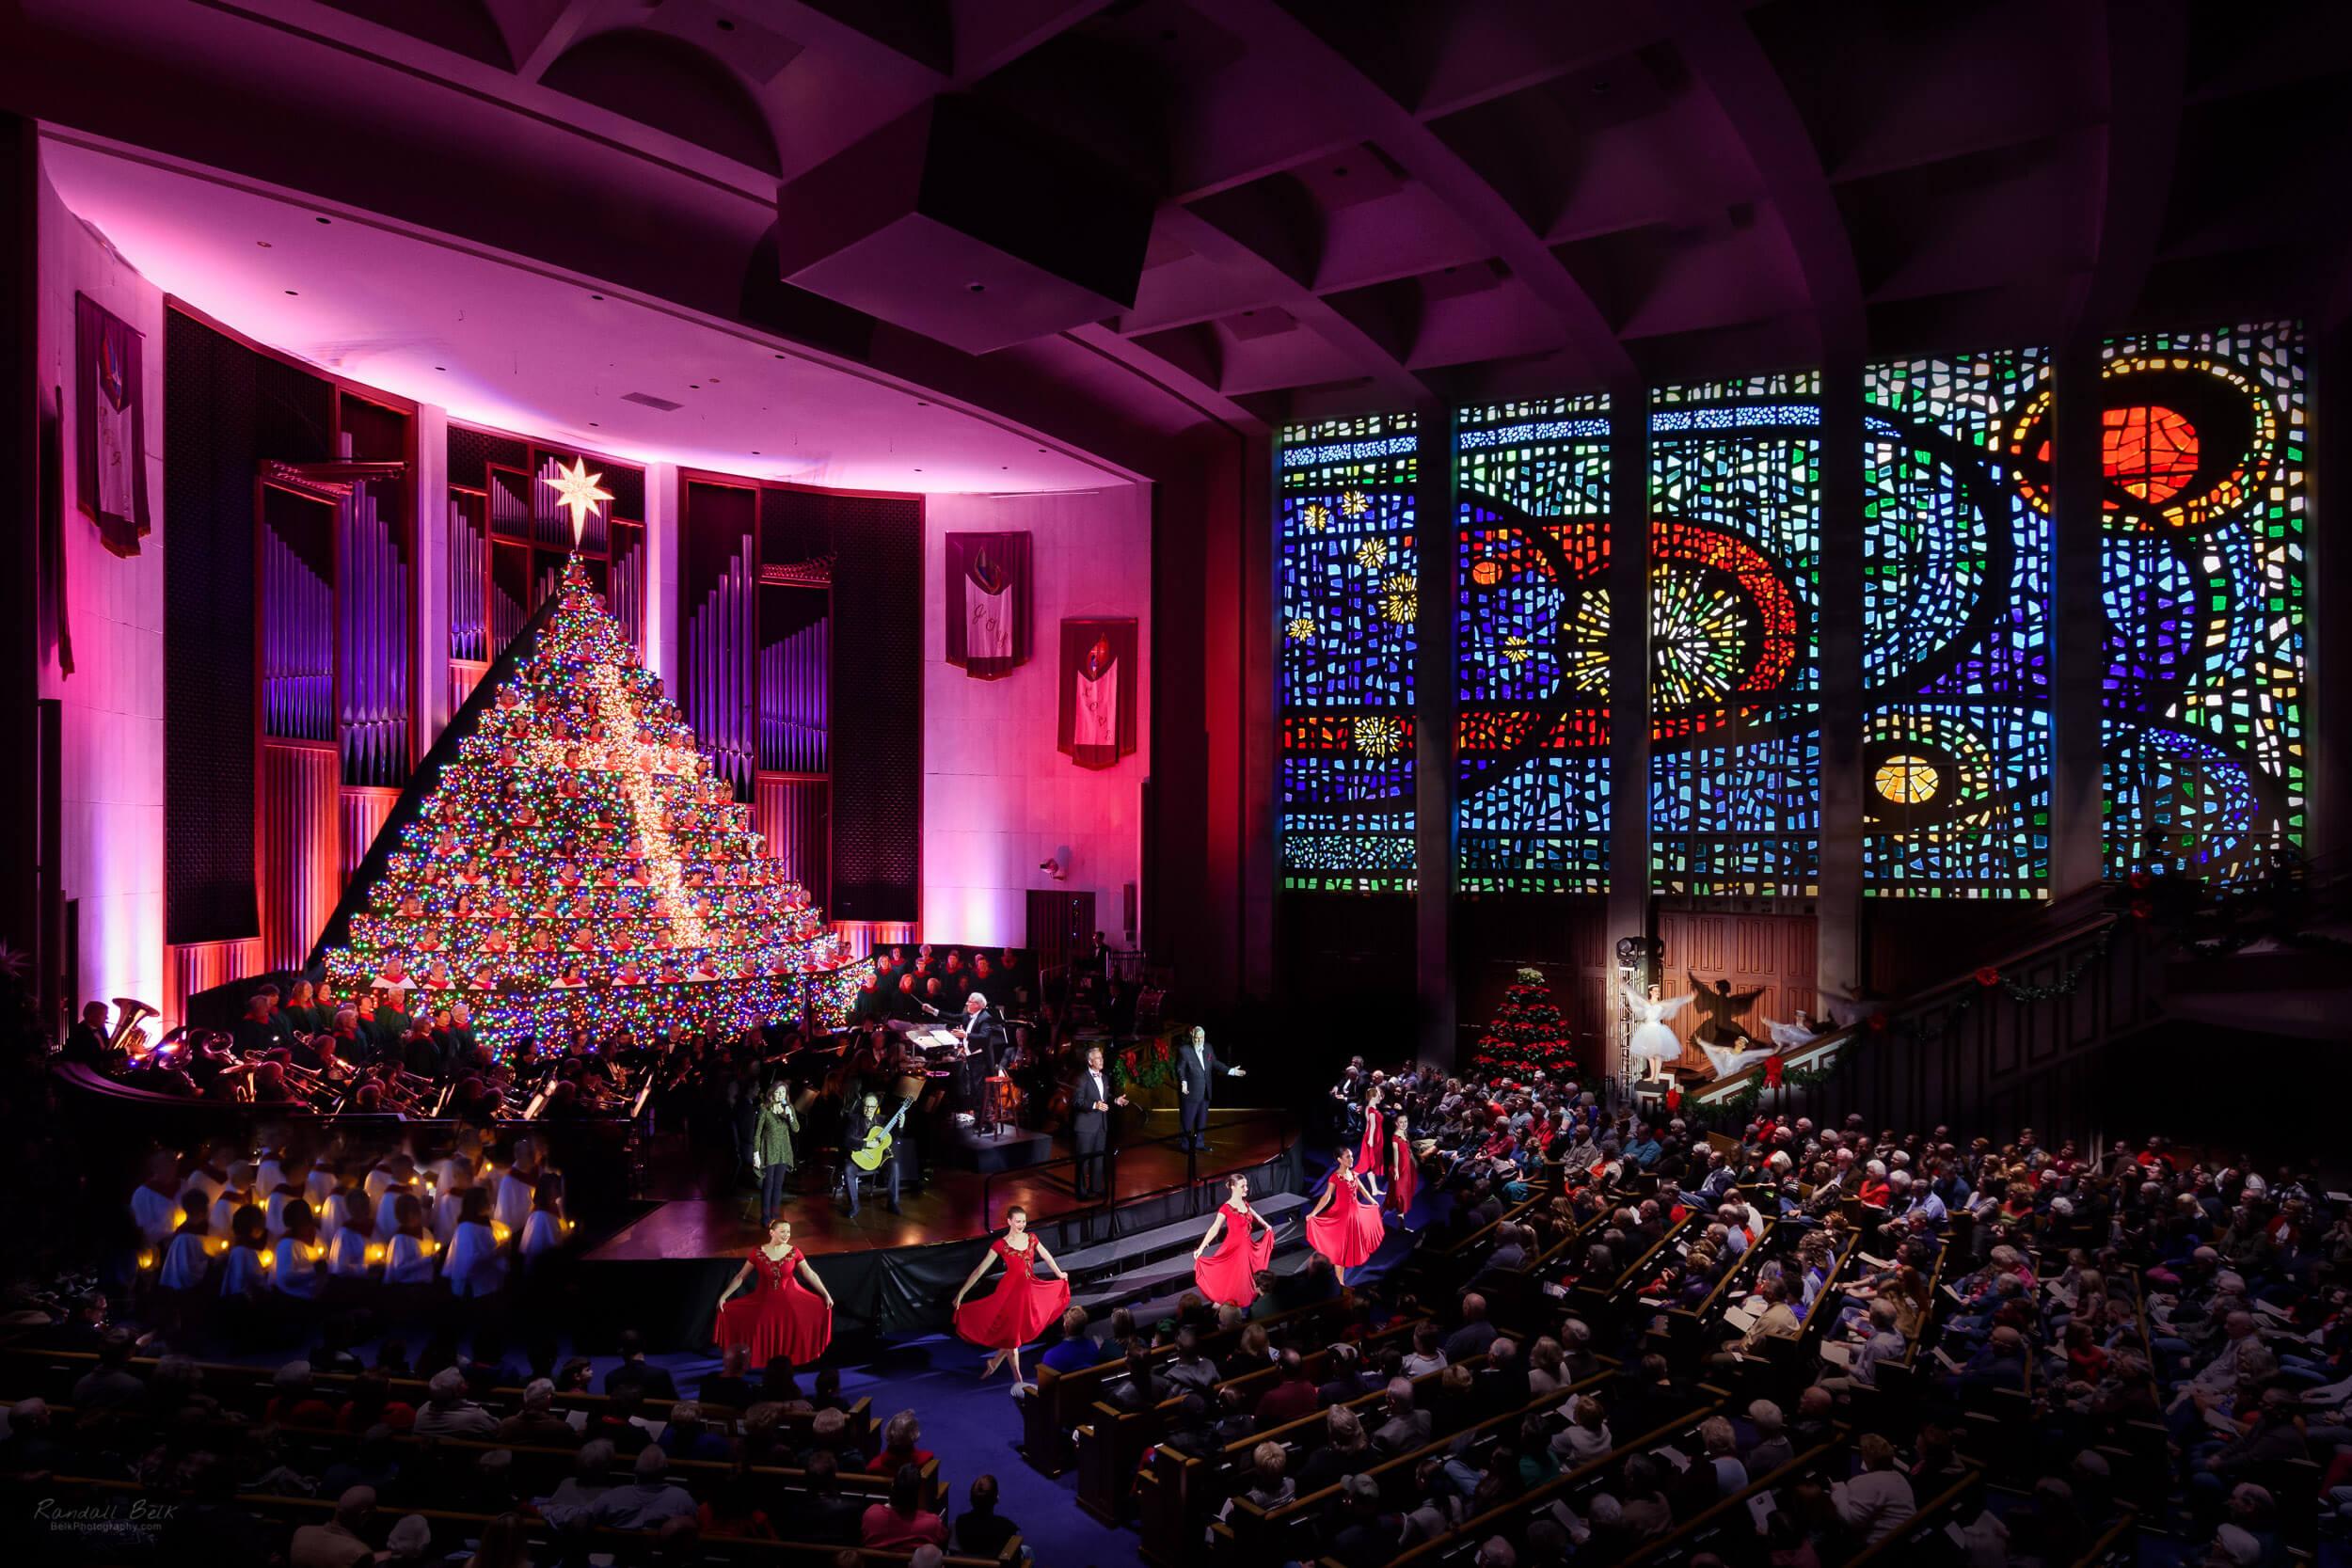 First Baptist Huntsville Al Living Christmas Tree 2020 The Living Christmas Tree in a Single Image